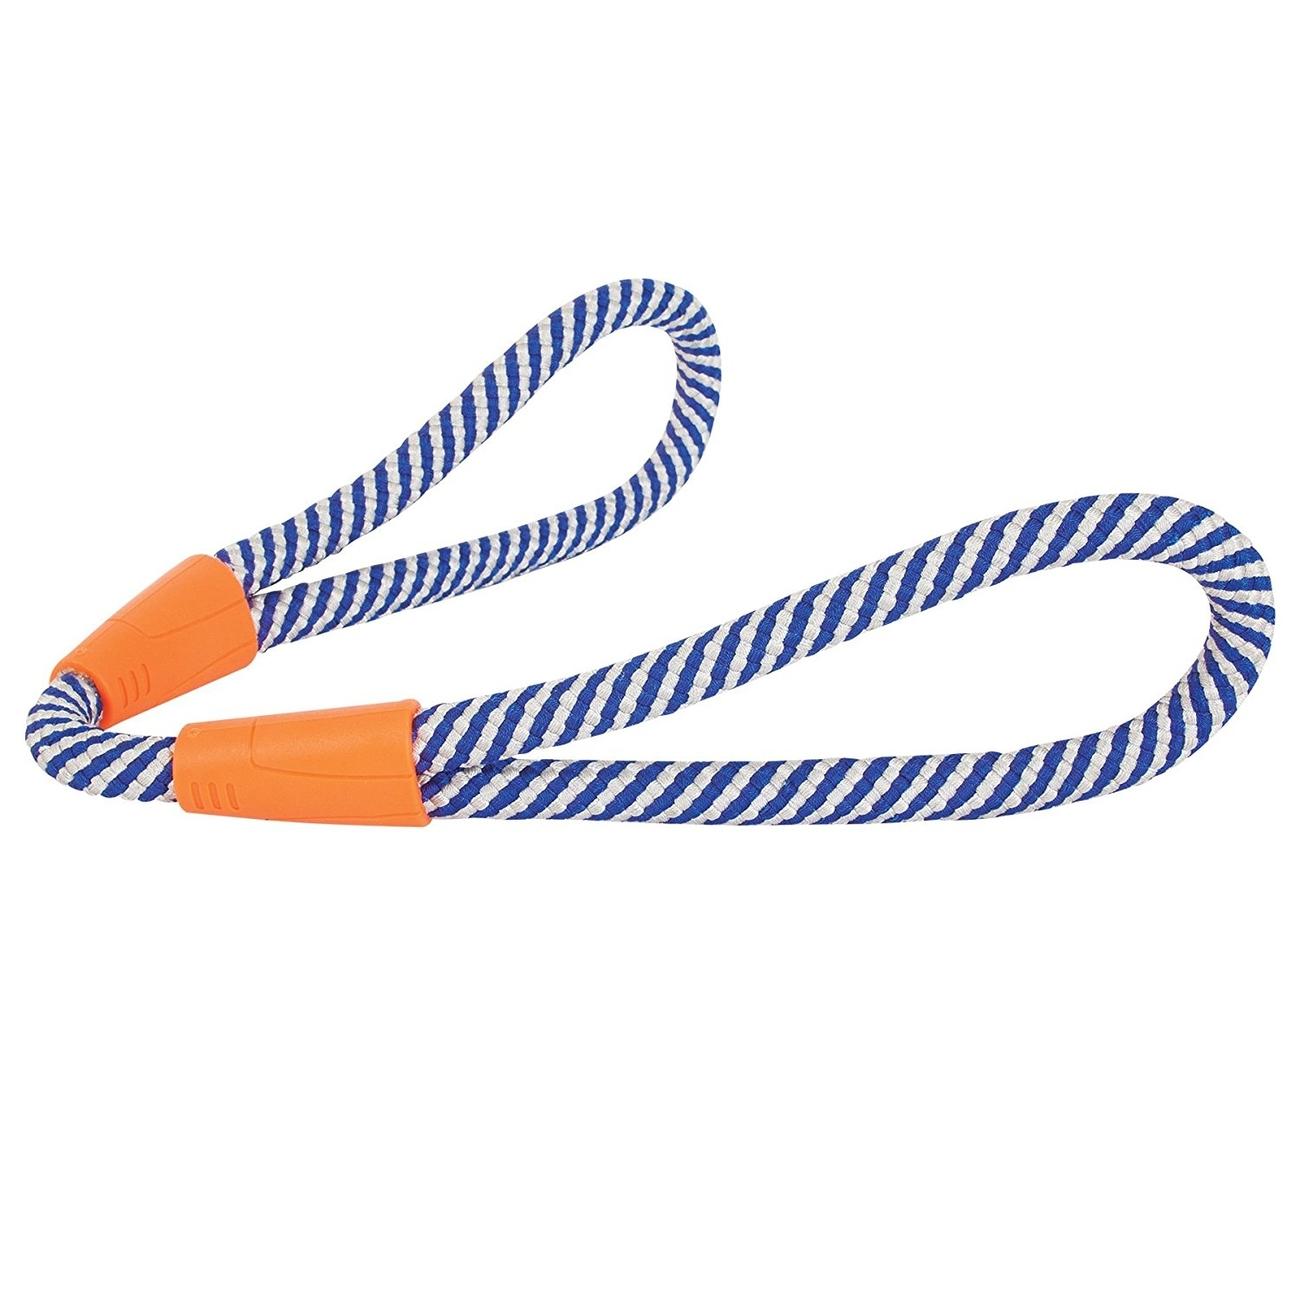 Chuckit! Mountain Rope Tug Zerrspielzeug für Hunde, Bild 2